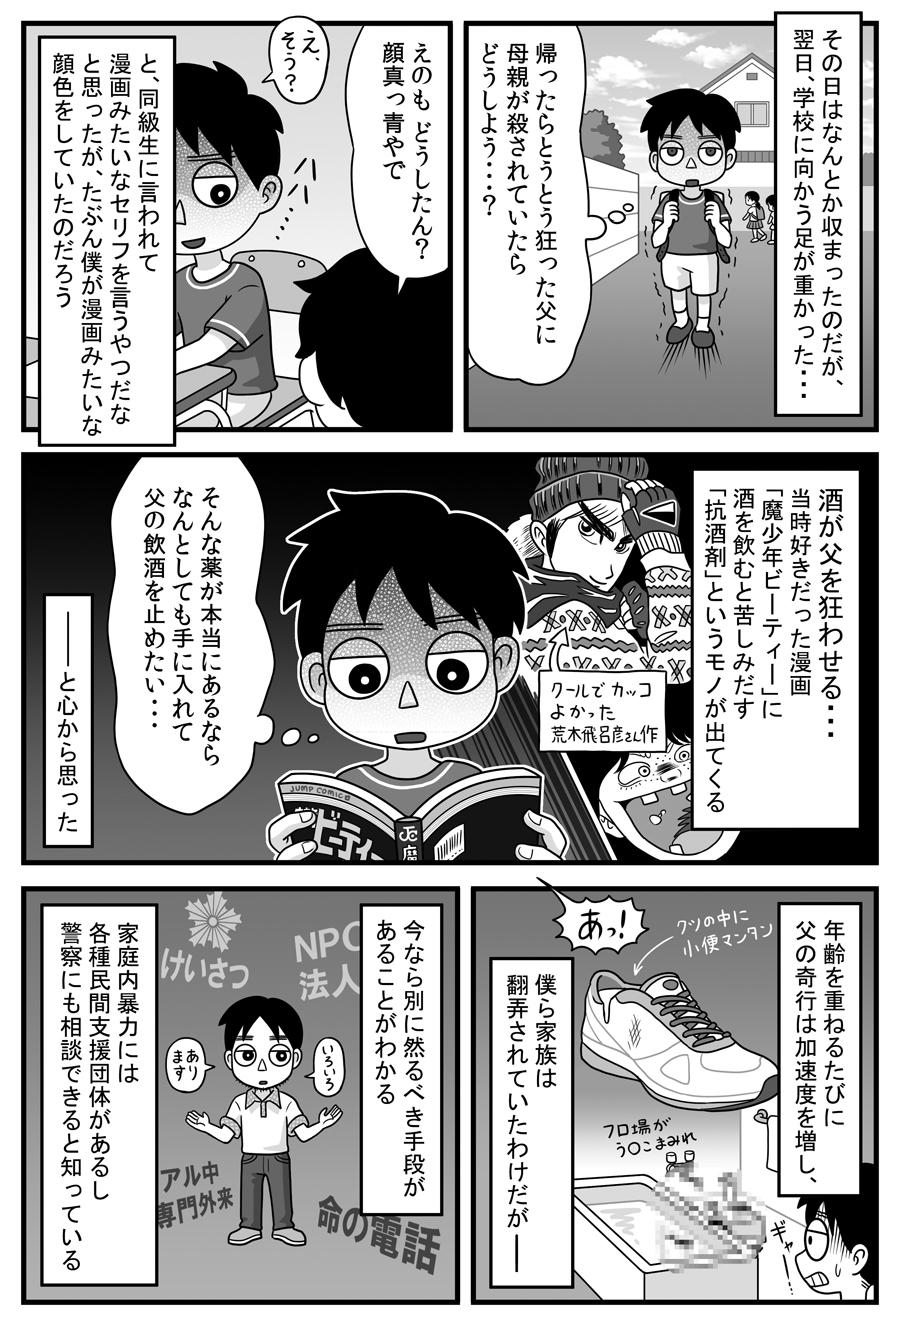 tokonokubo-b09-P03.jpg